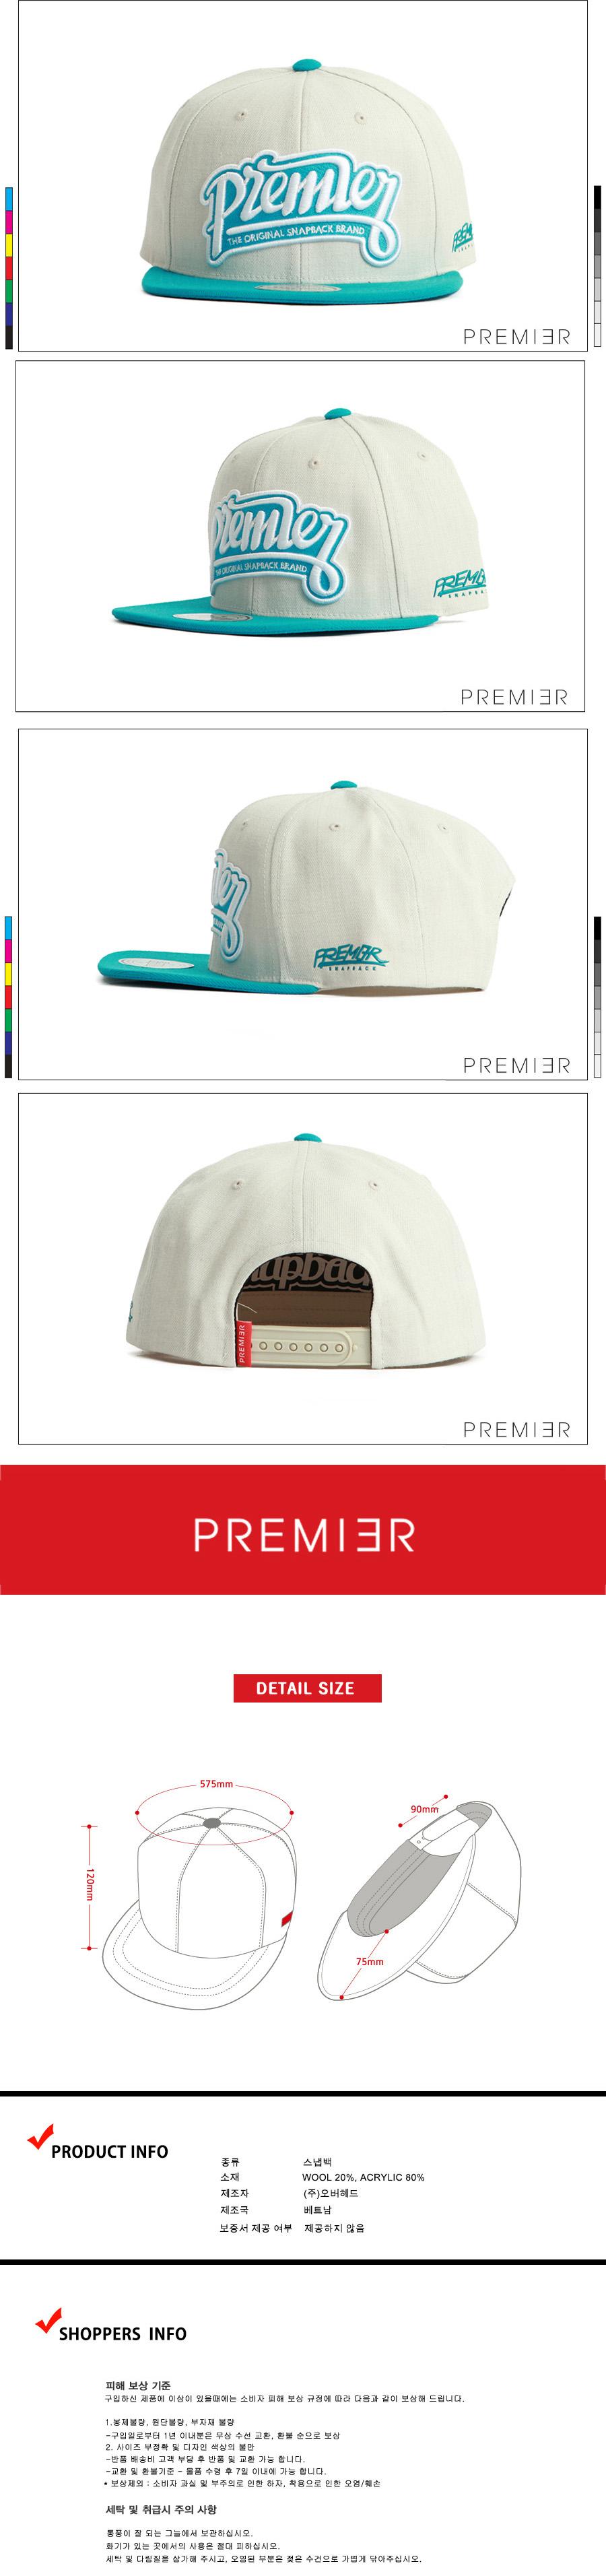 [ PREMIER ] [Premier] Snapback Cursive Logo Beige/Aqua (P763)